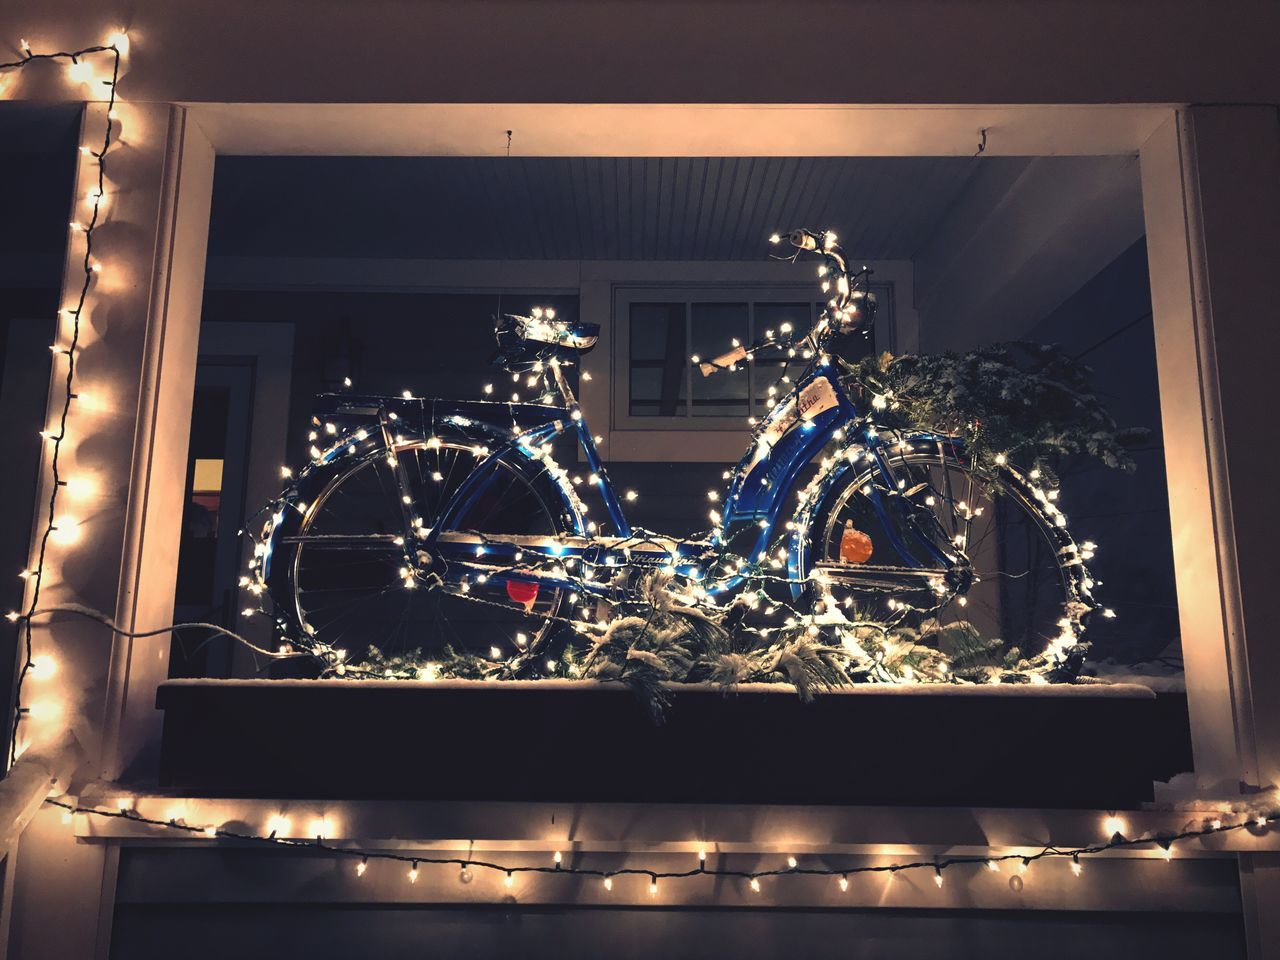 illuminated, night, no people, indoors, christmas decoration, christmas, christmas lights, architecture, close-up